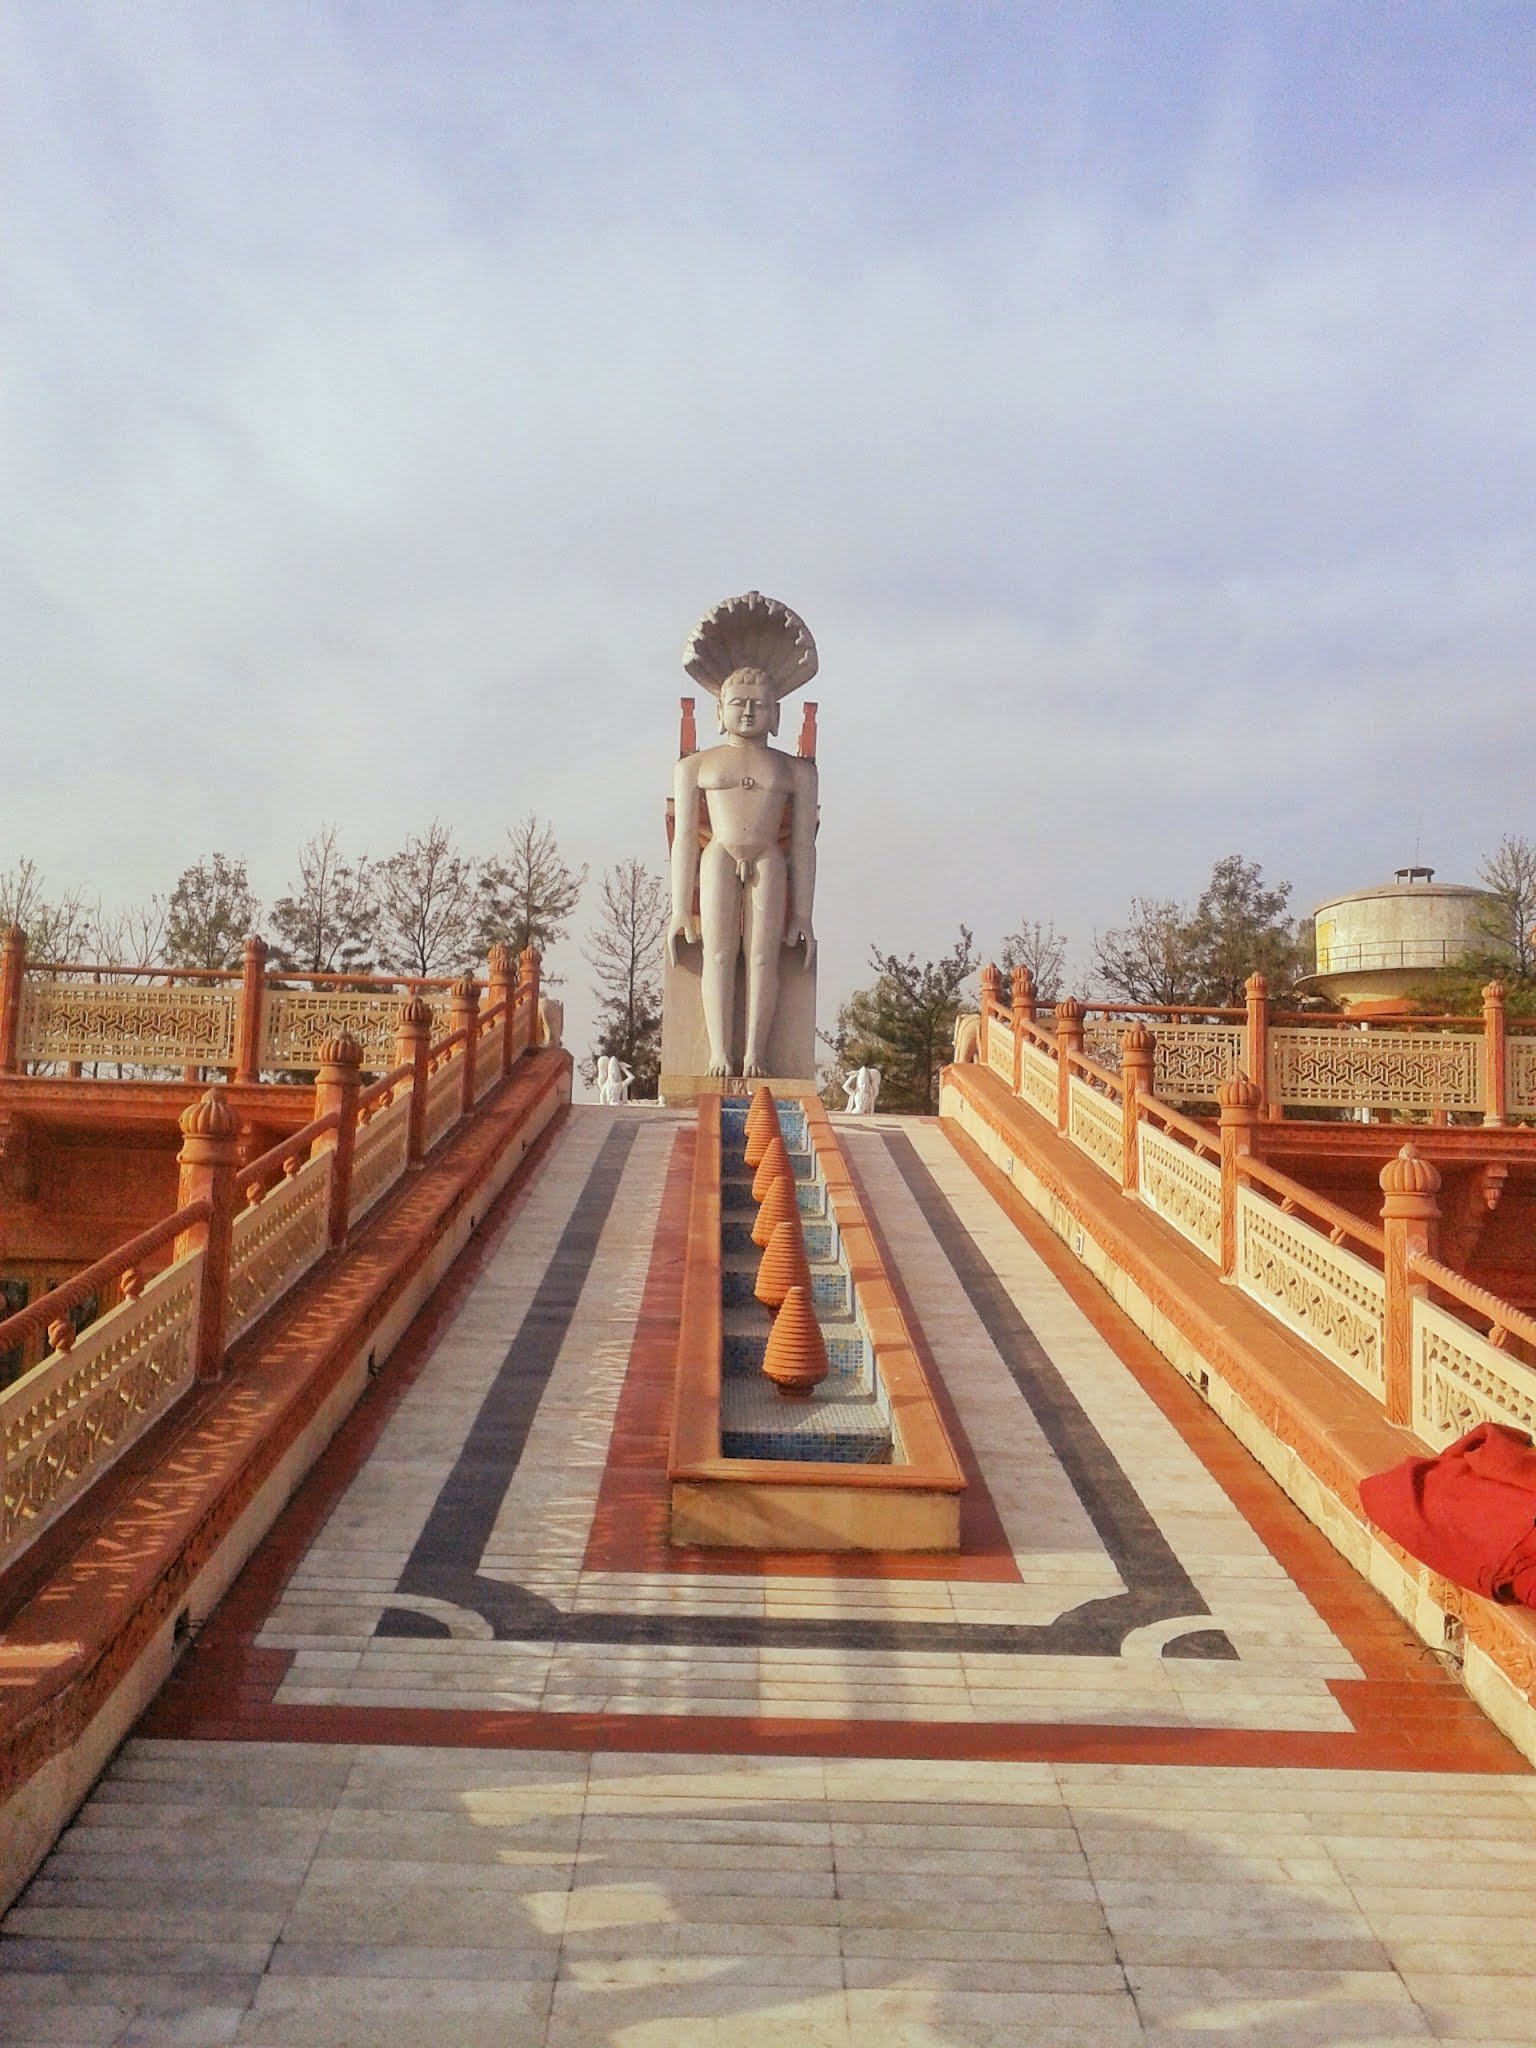 Vahelna jain mandir, Muzaffarnagar